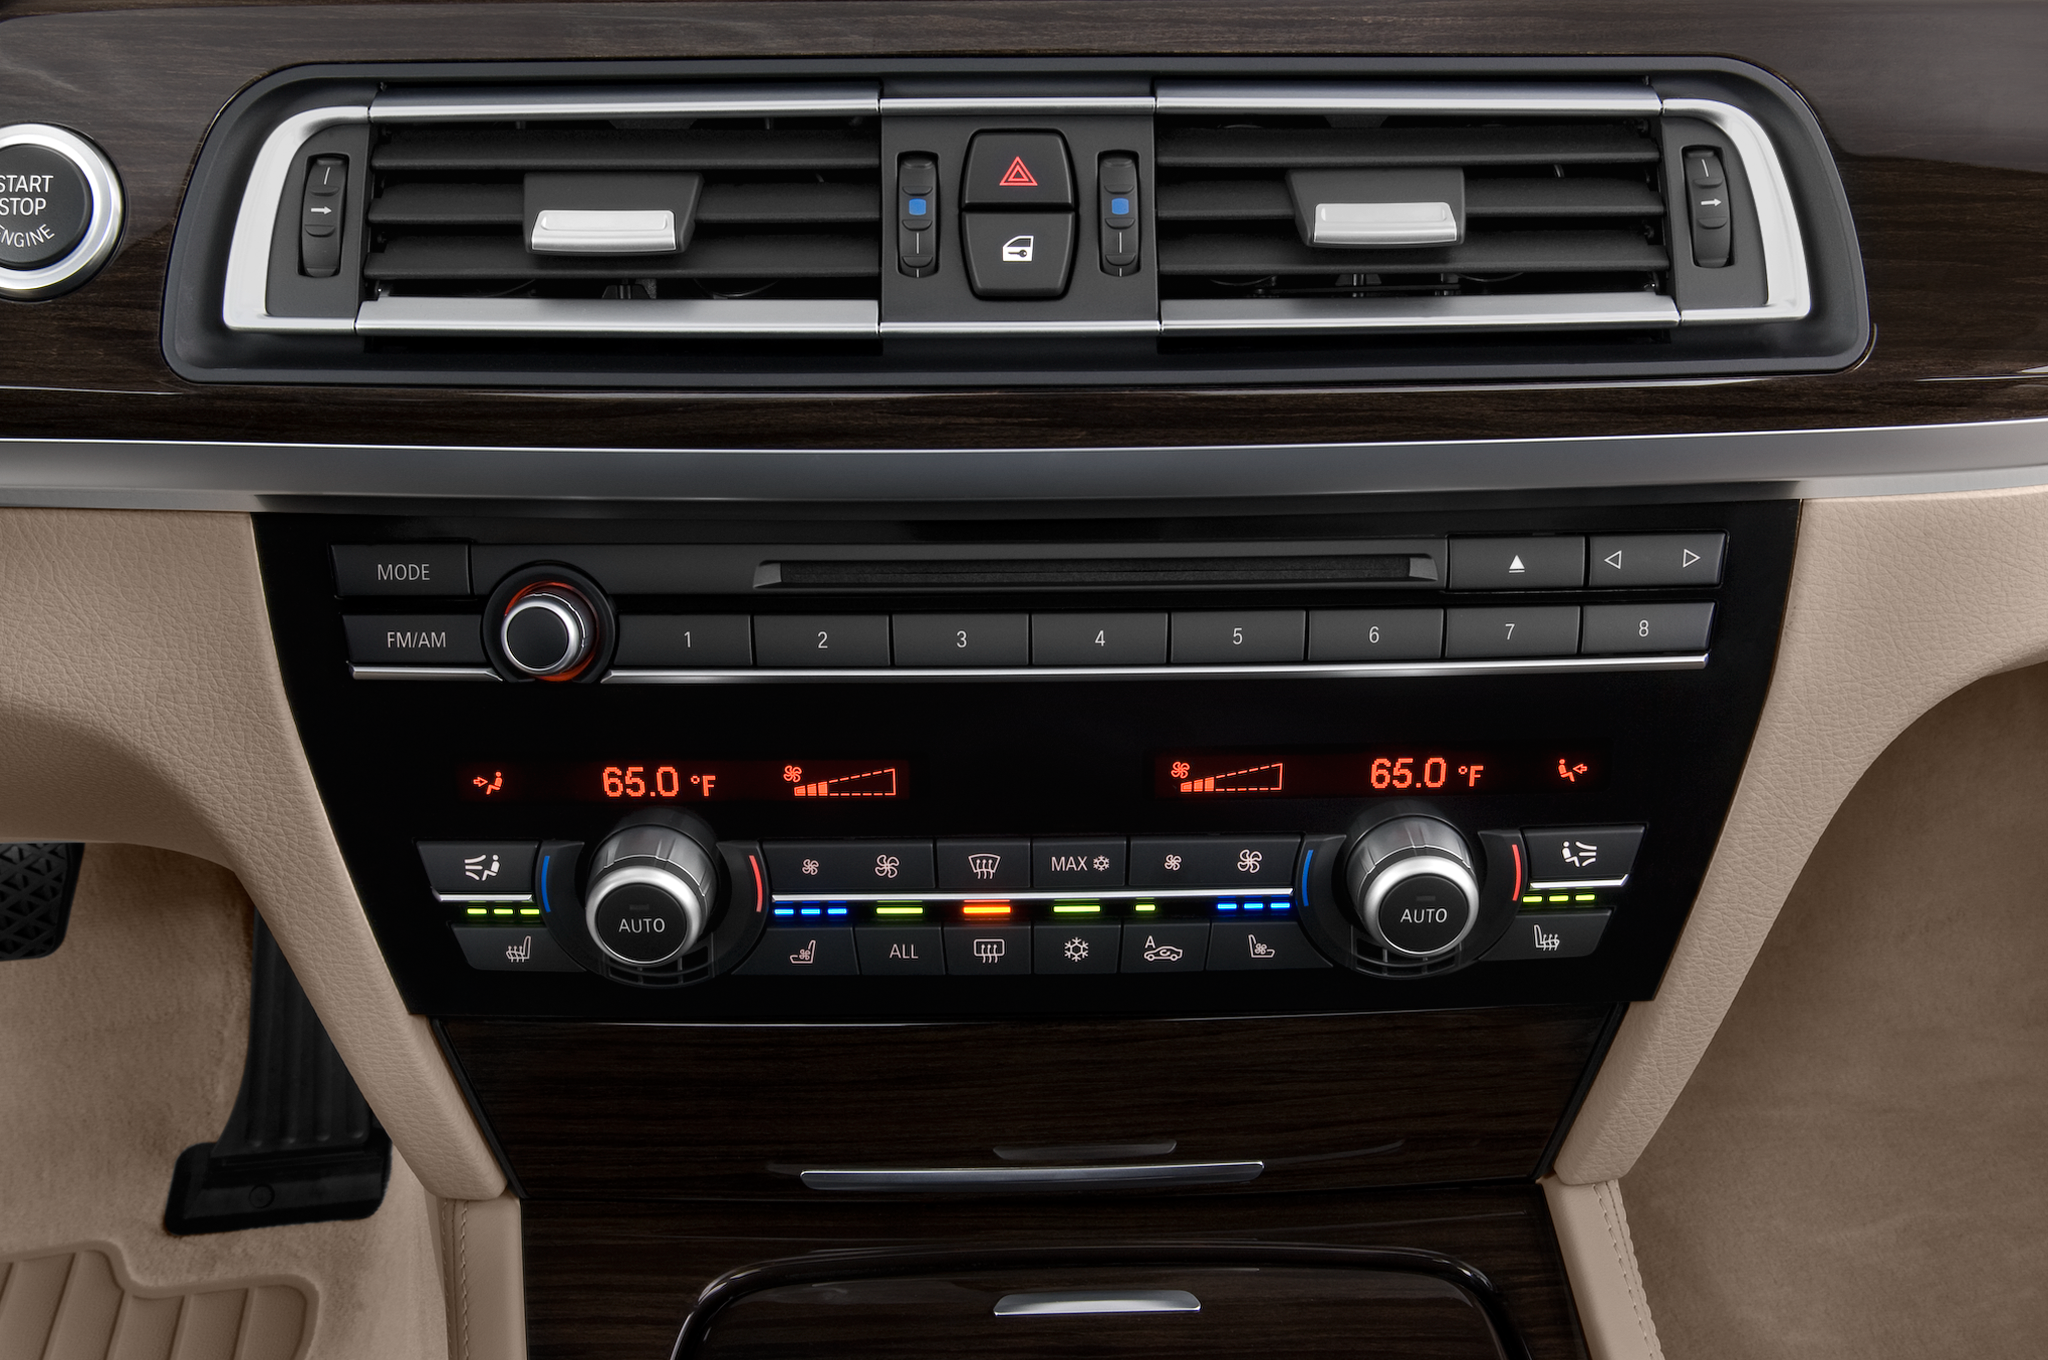 BMW Announces 2013 Alpina B7 Starts at $127 600 #604C3F